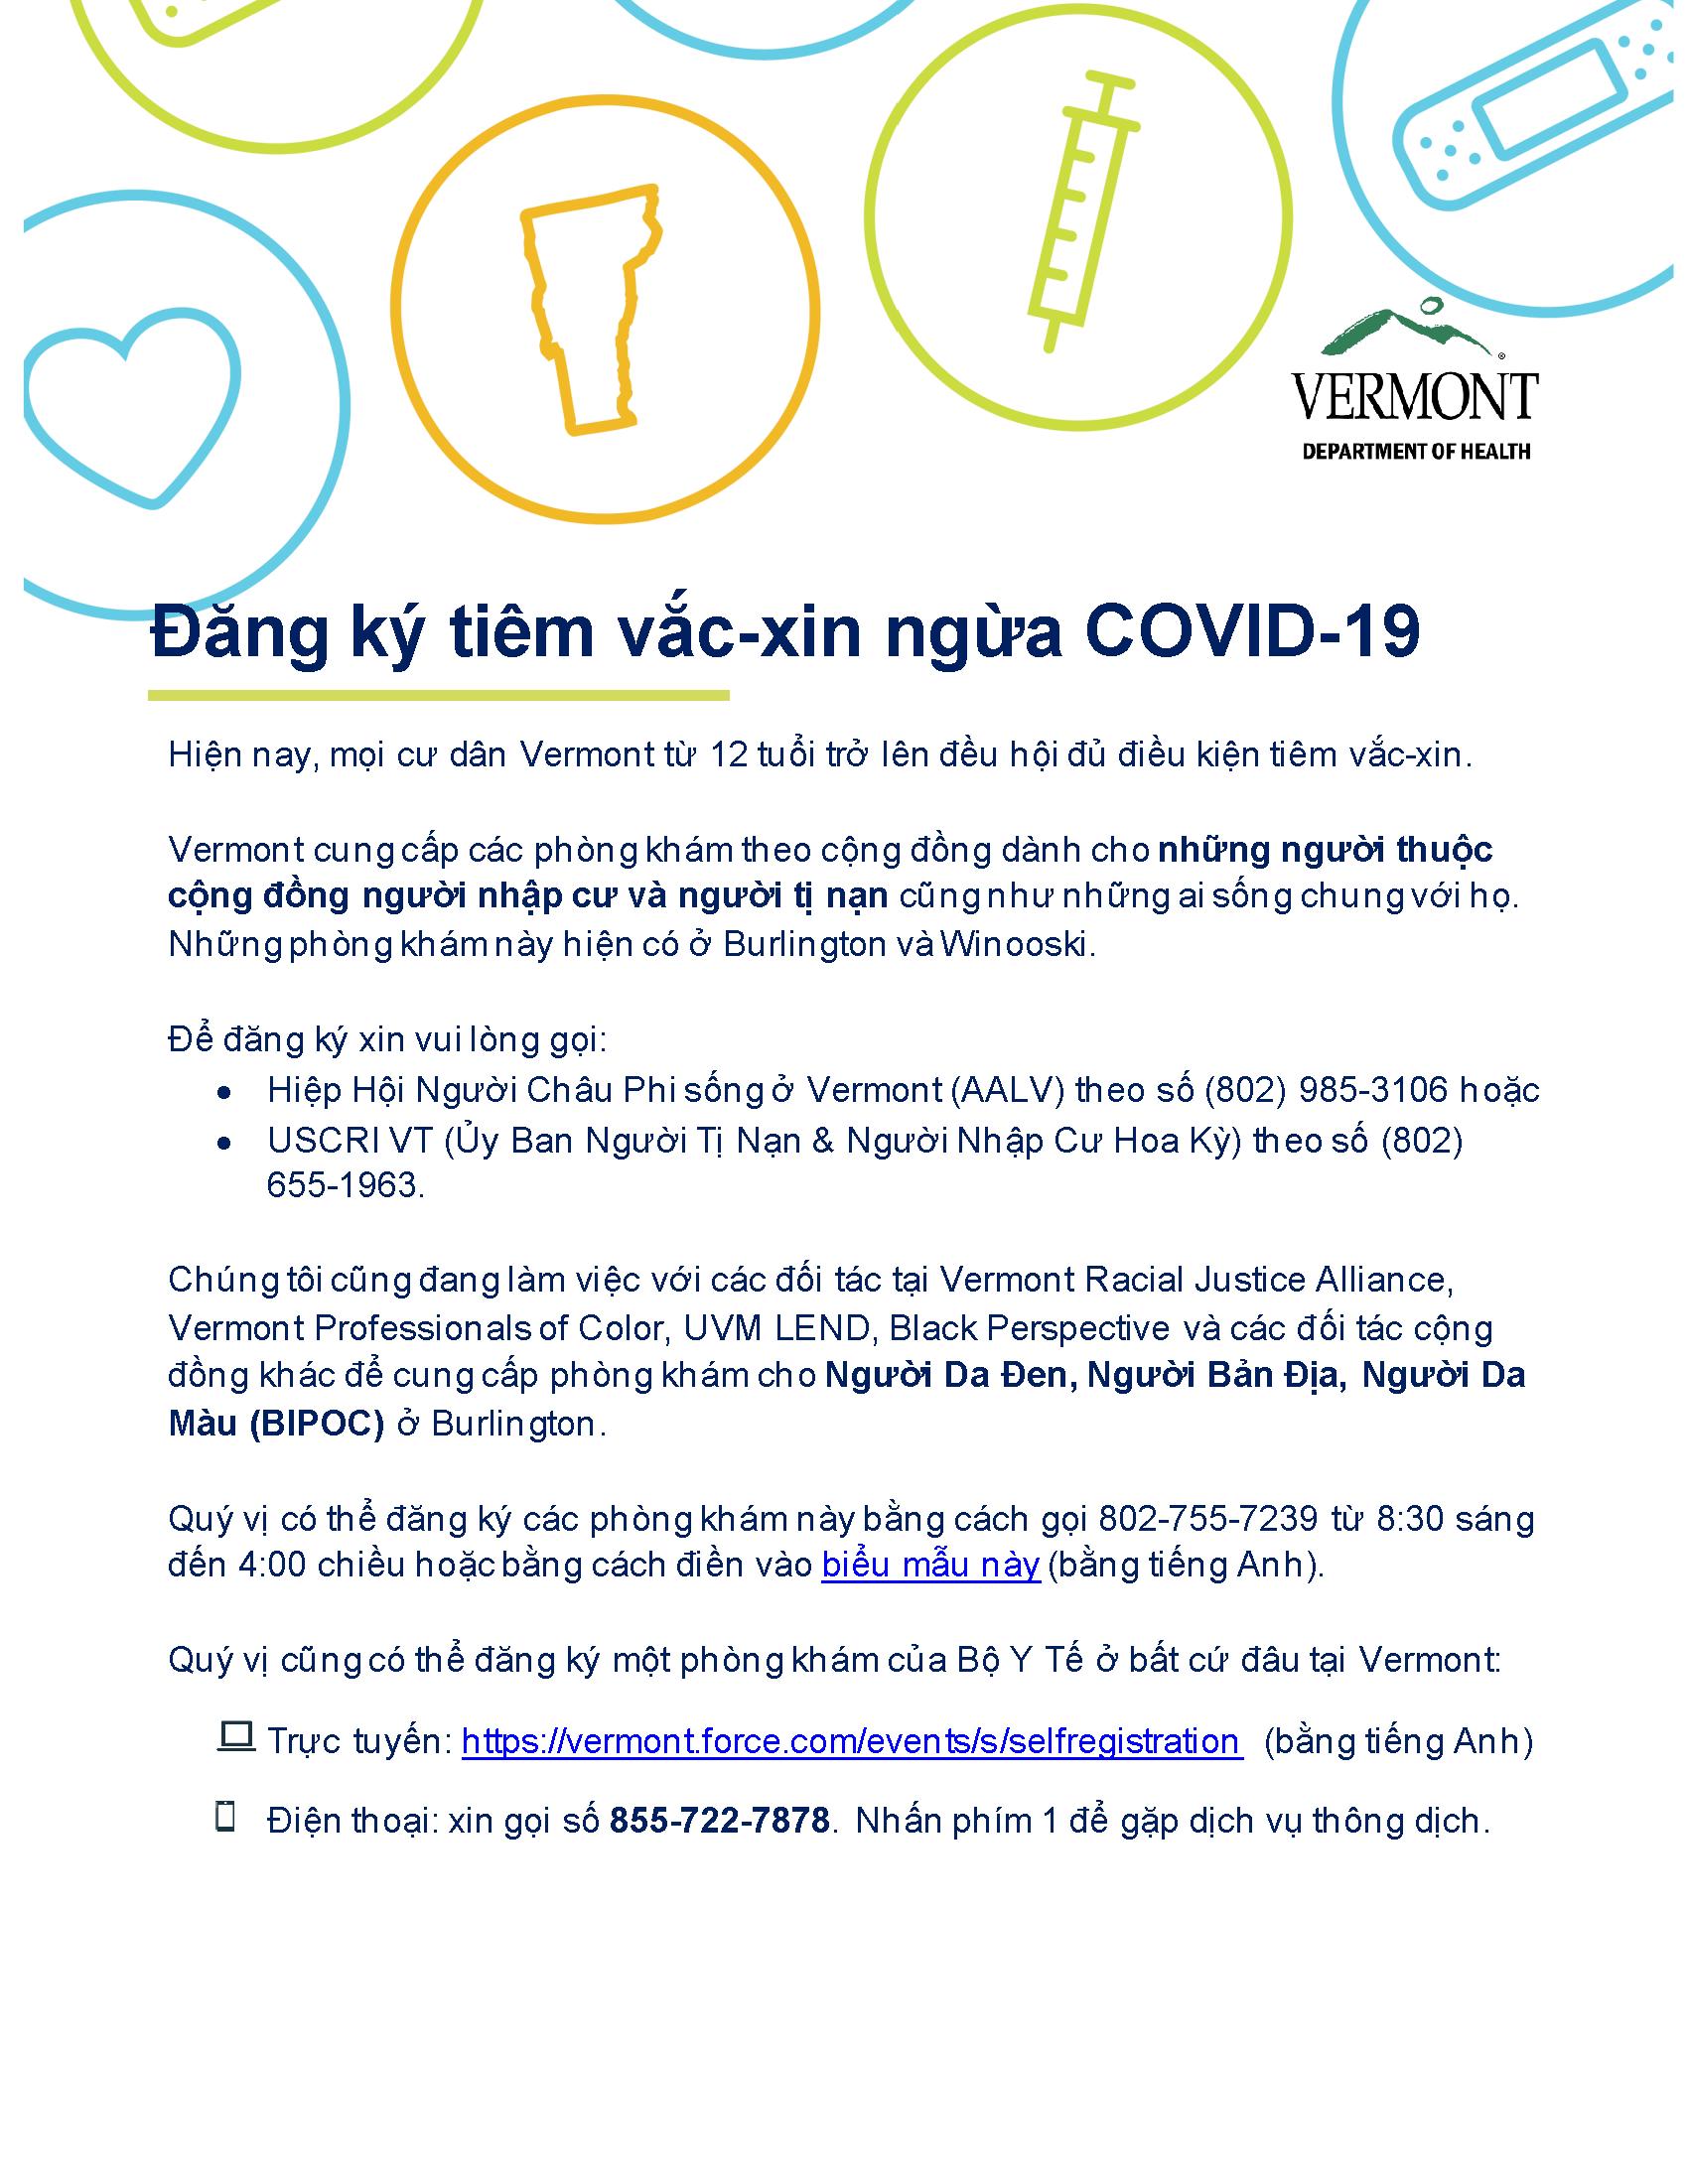 vaccine registration info - Vietnamese